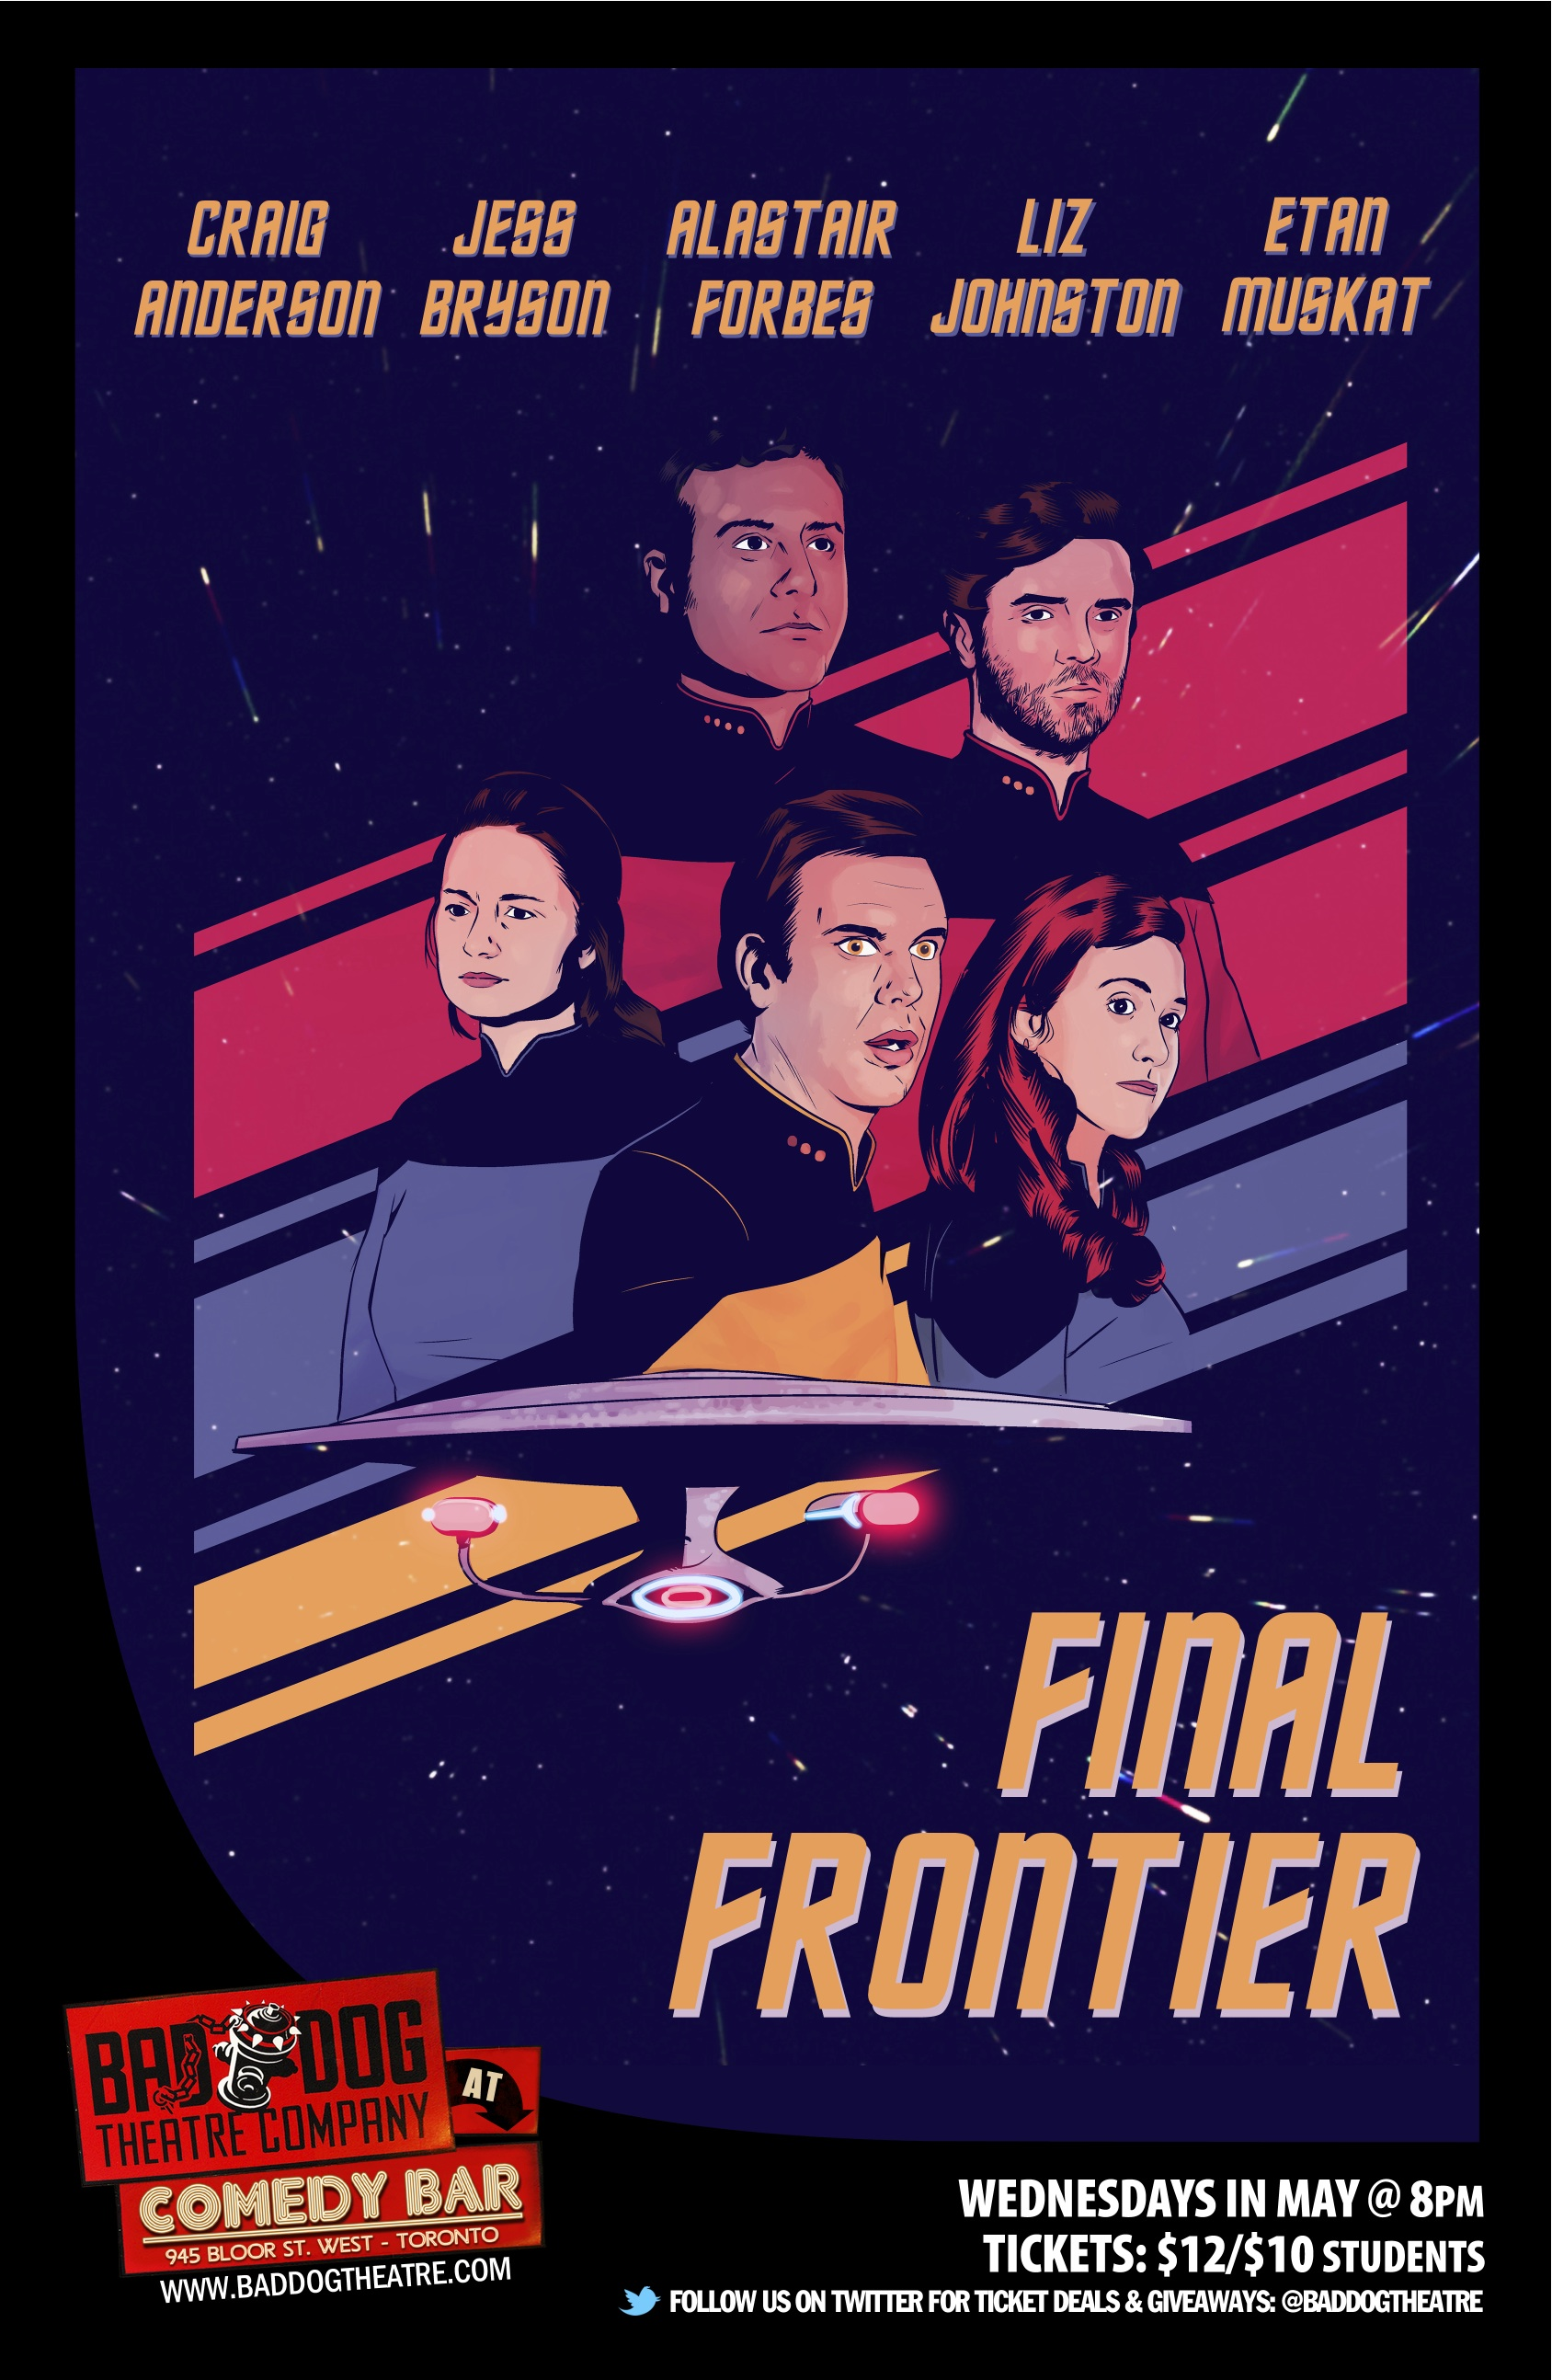 final frontier illustrated.jpg